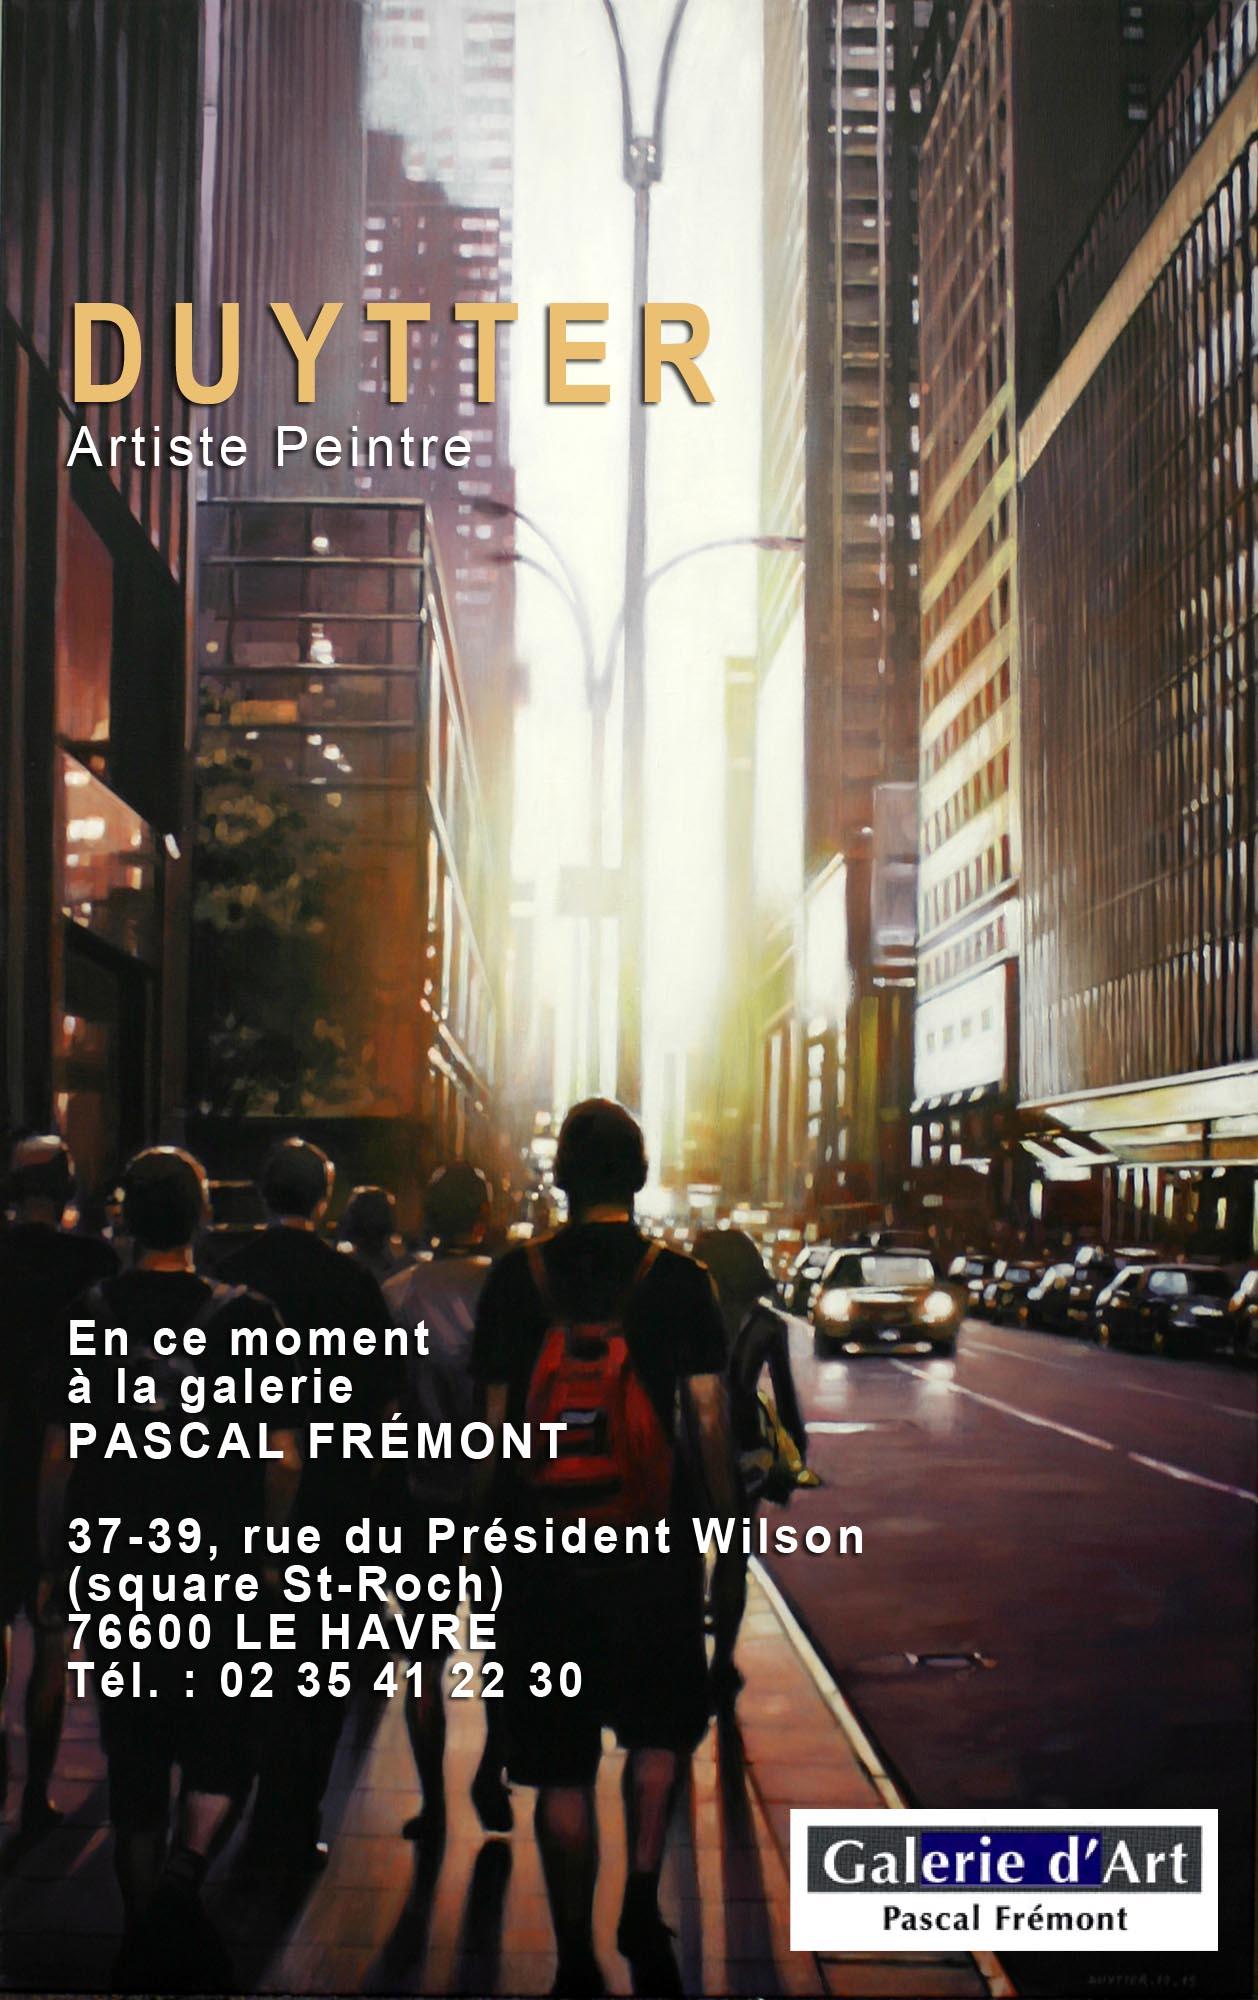 Galerie Pascal Fremont Le Havre